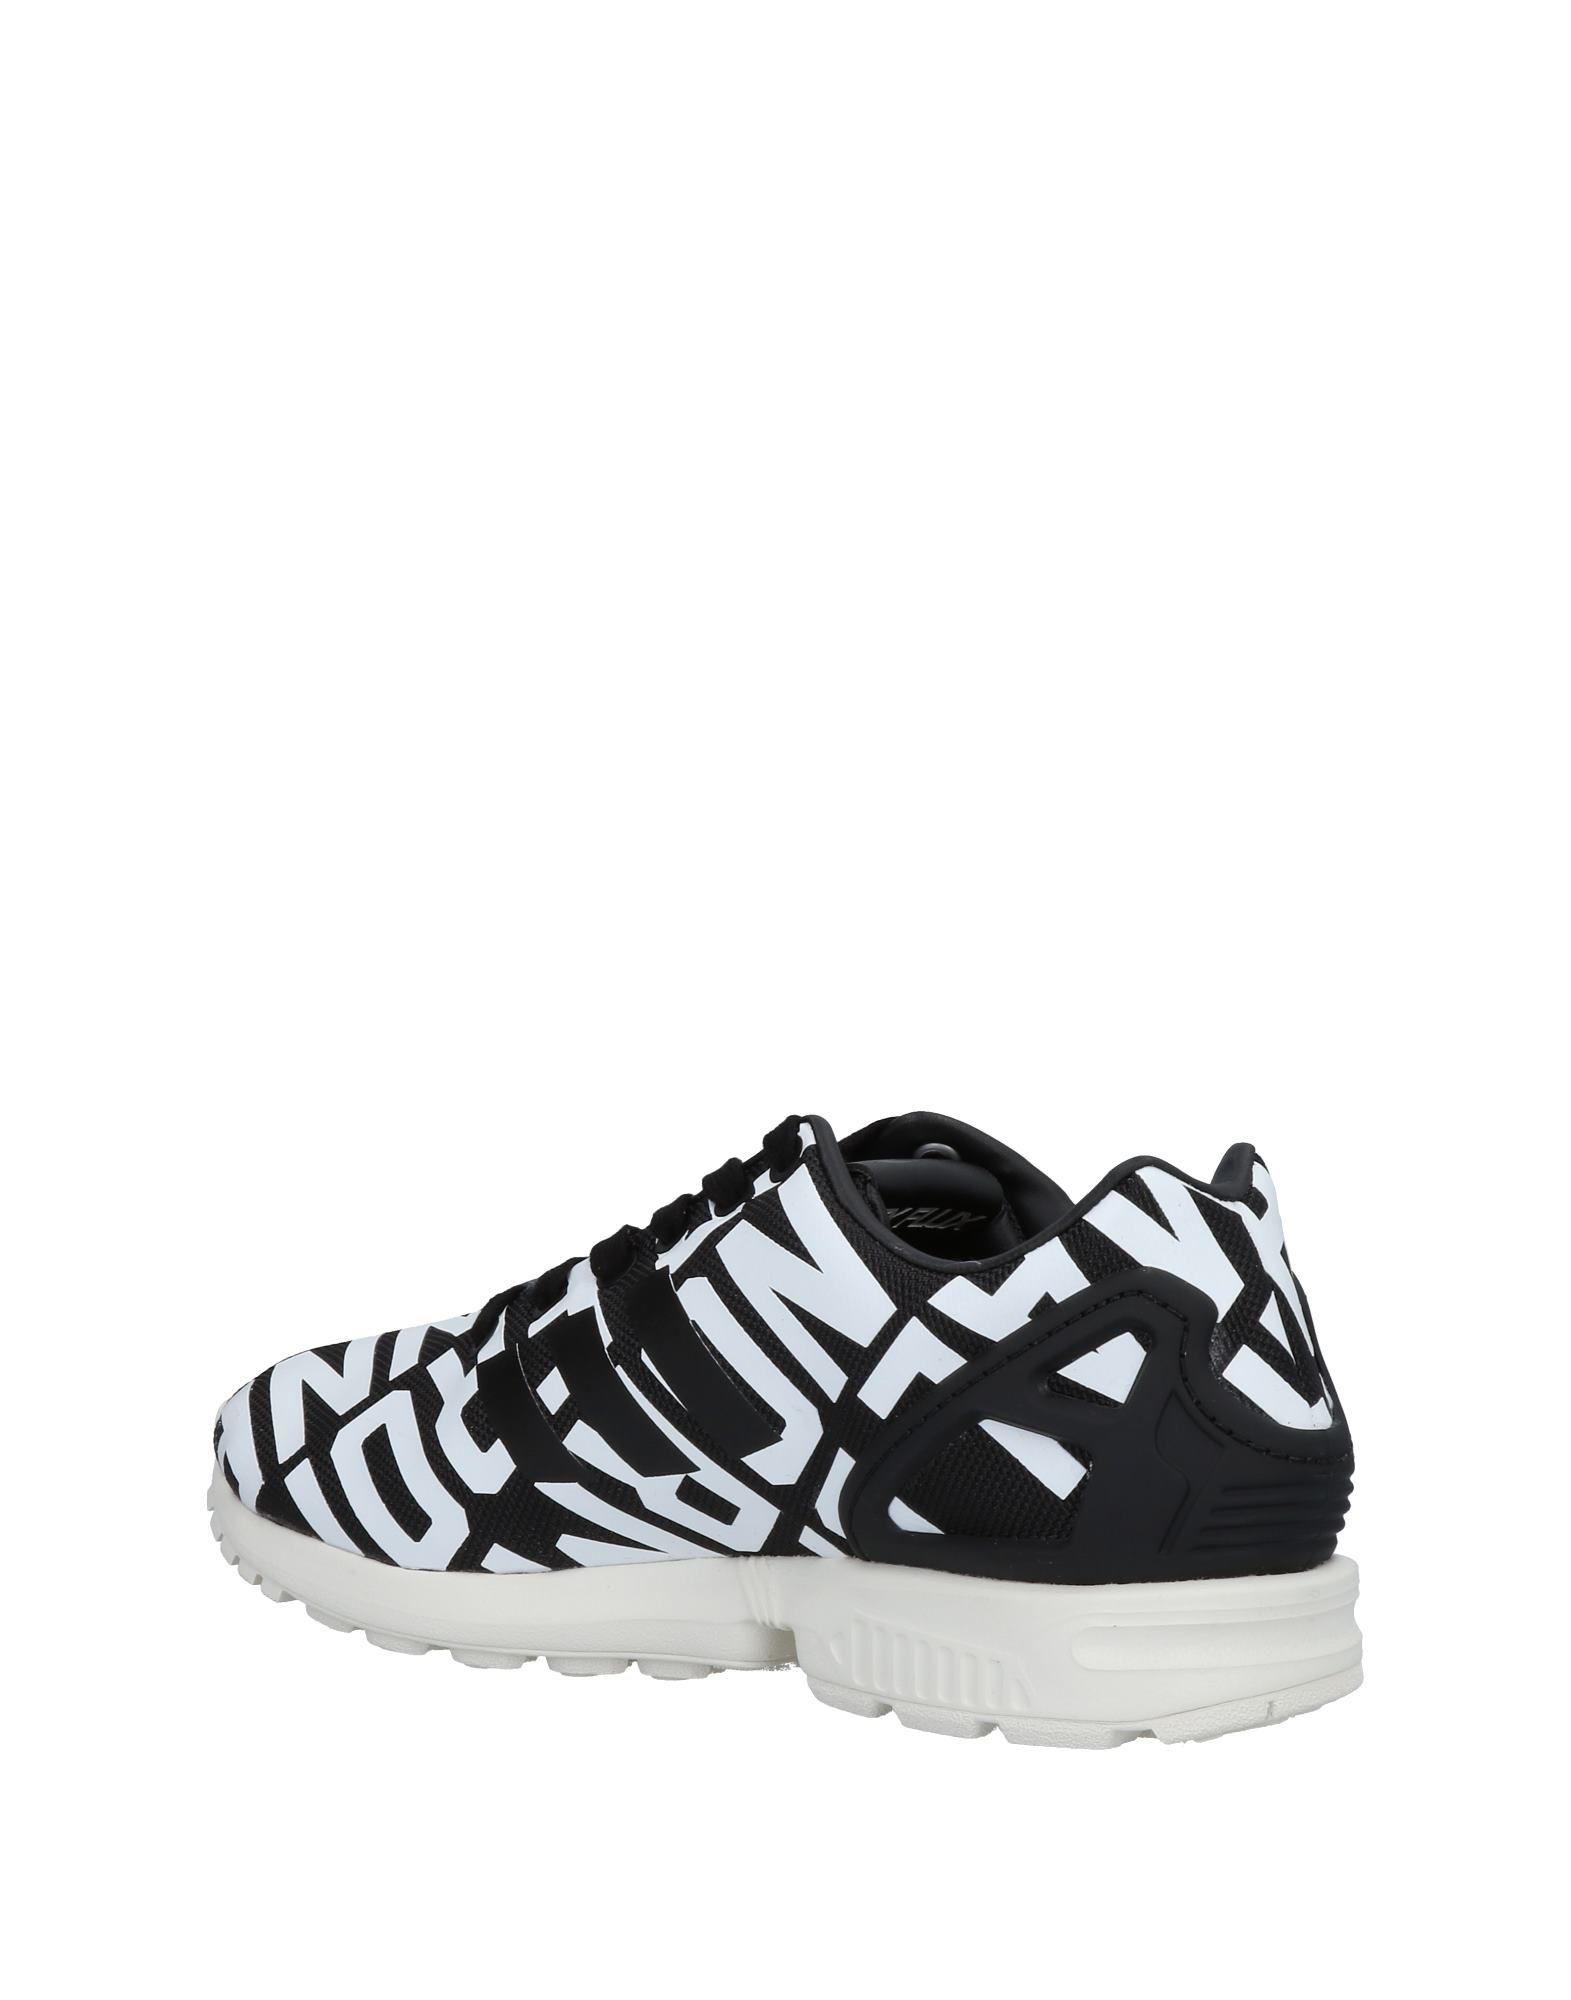 Adidas Originals Sneakers  Damen  Sneakers 11486321BK a8d06c